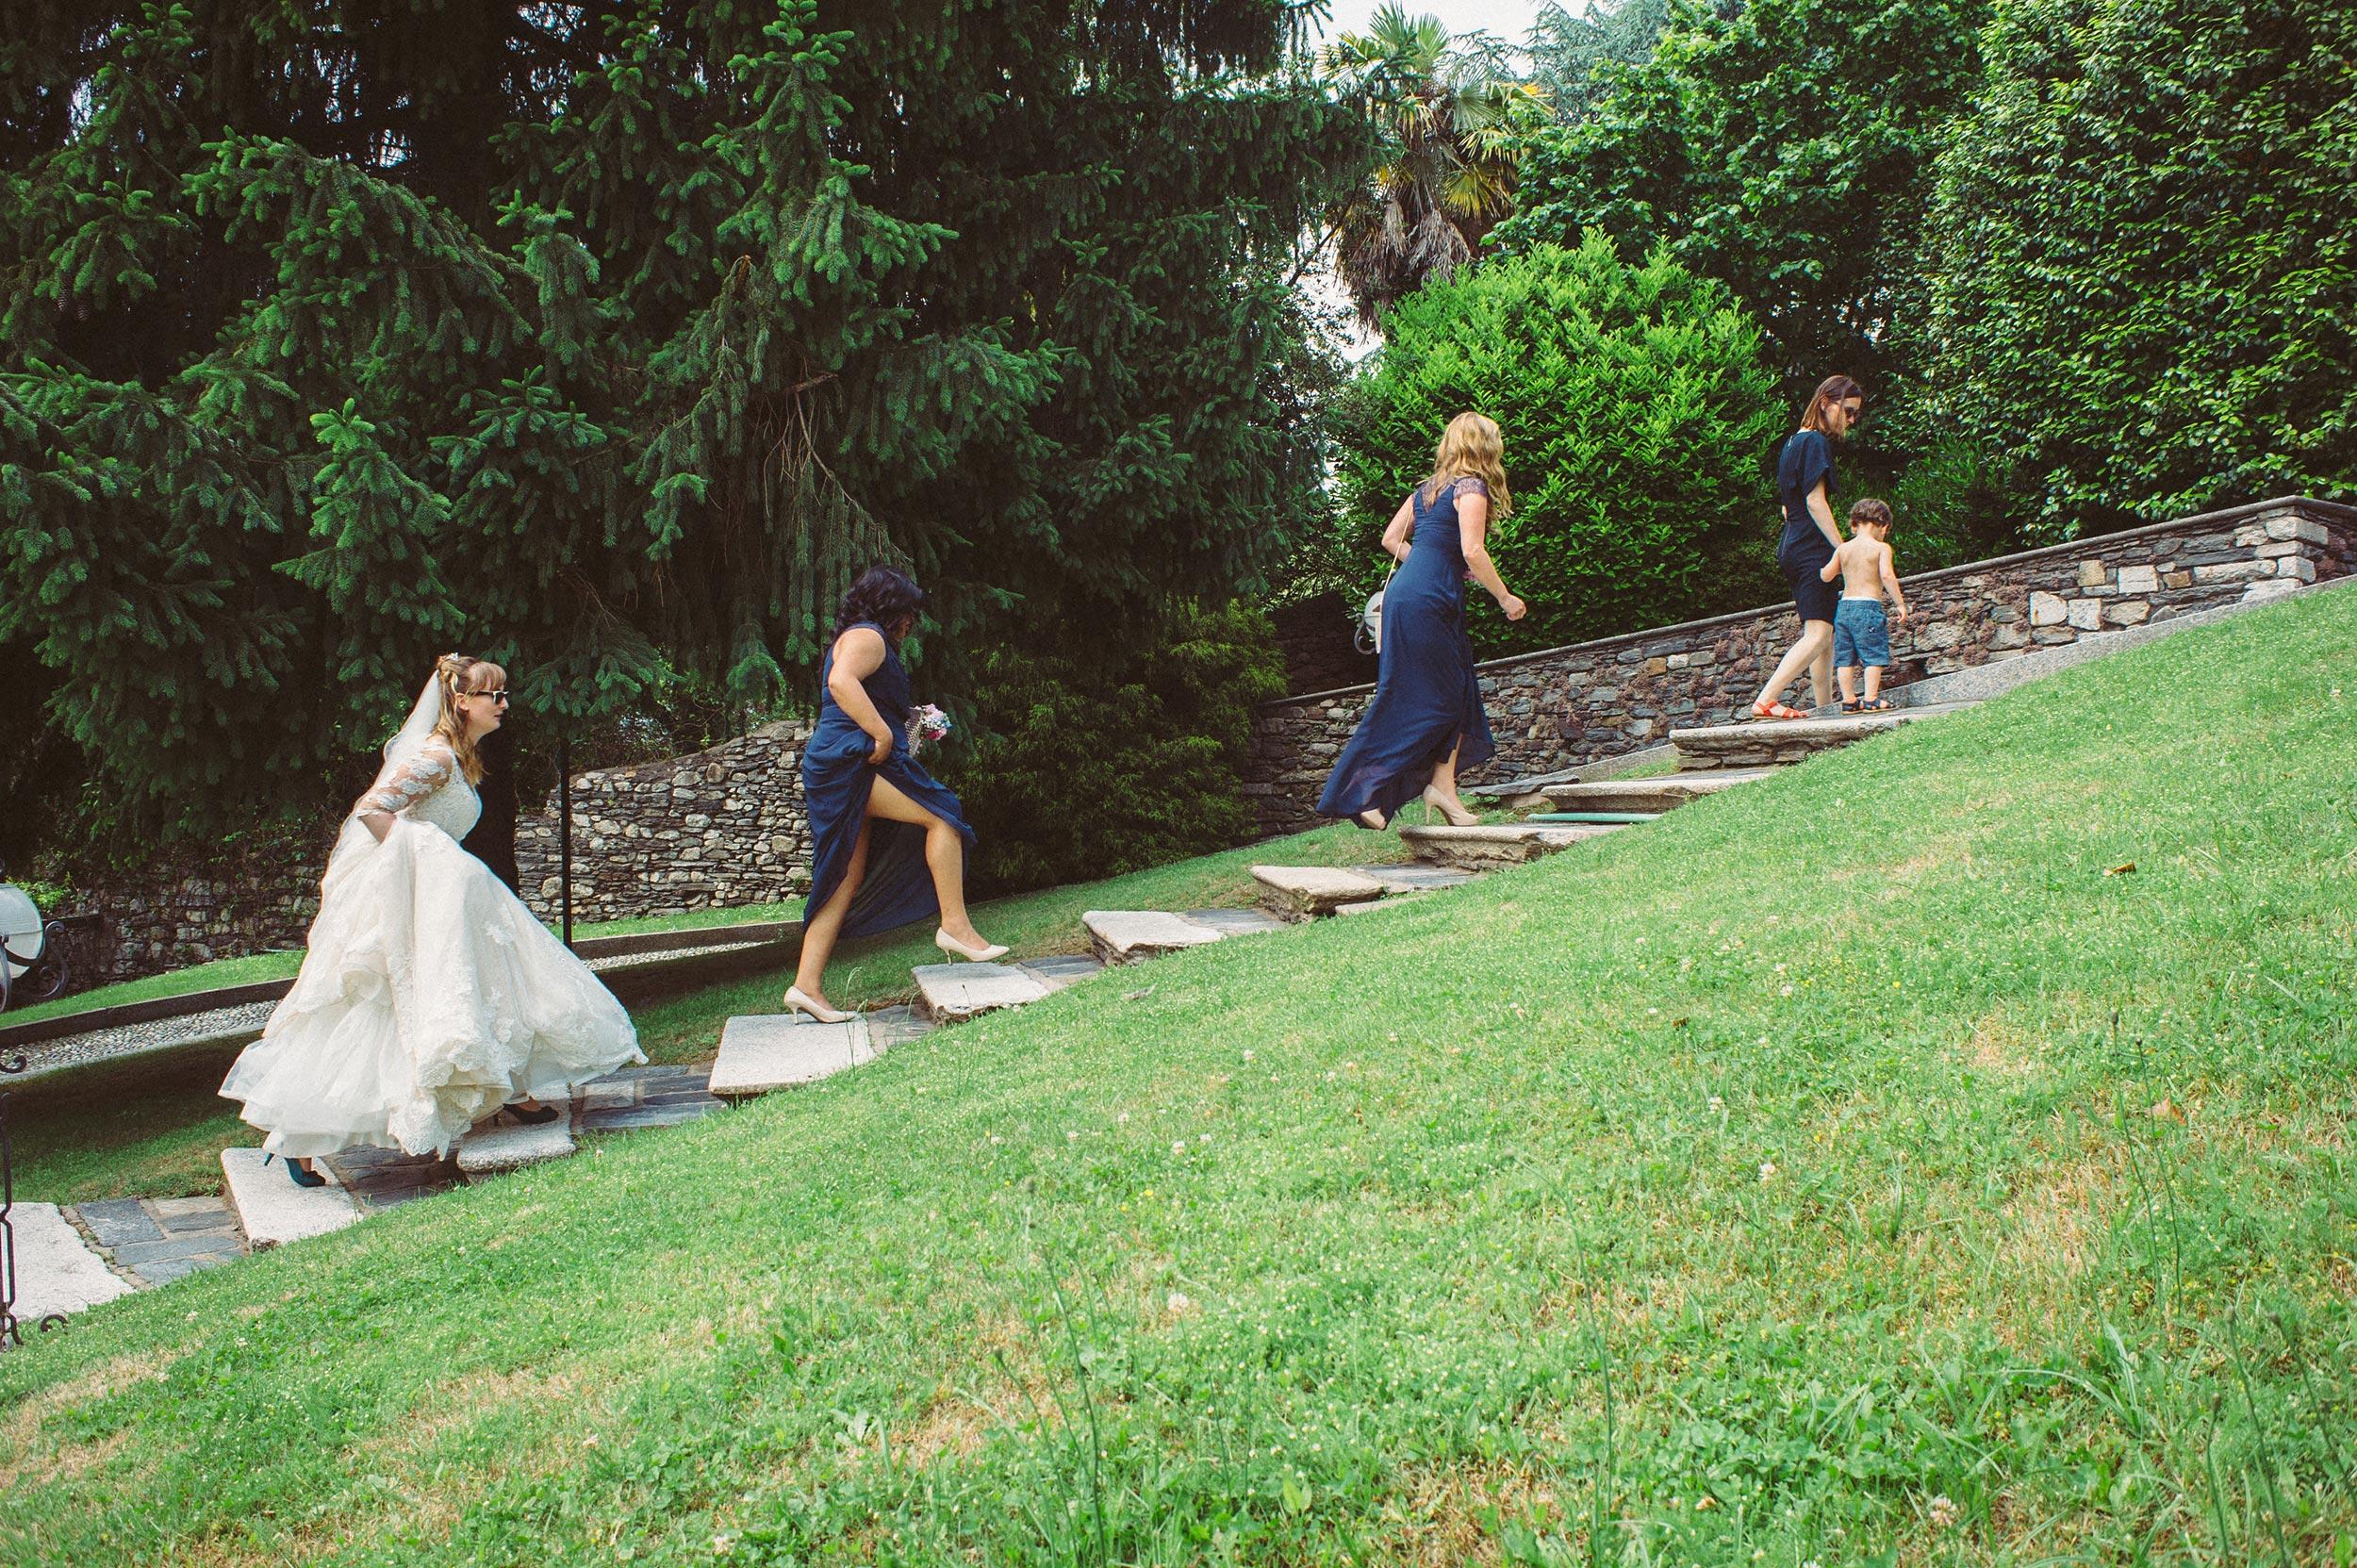 2016-Julius-Silke-Lake-Orta-Wedding-Photographer-Italy-Alessandro-Avenali-71.jpg